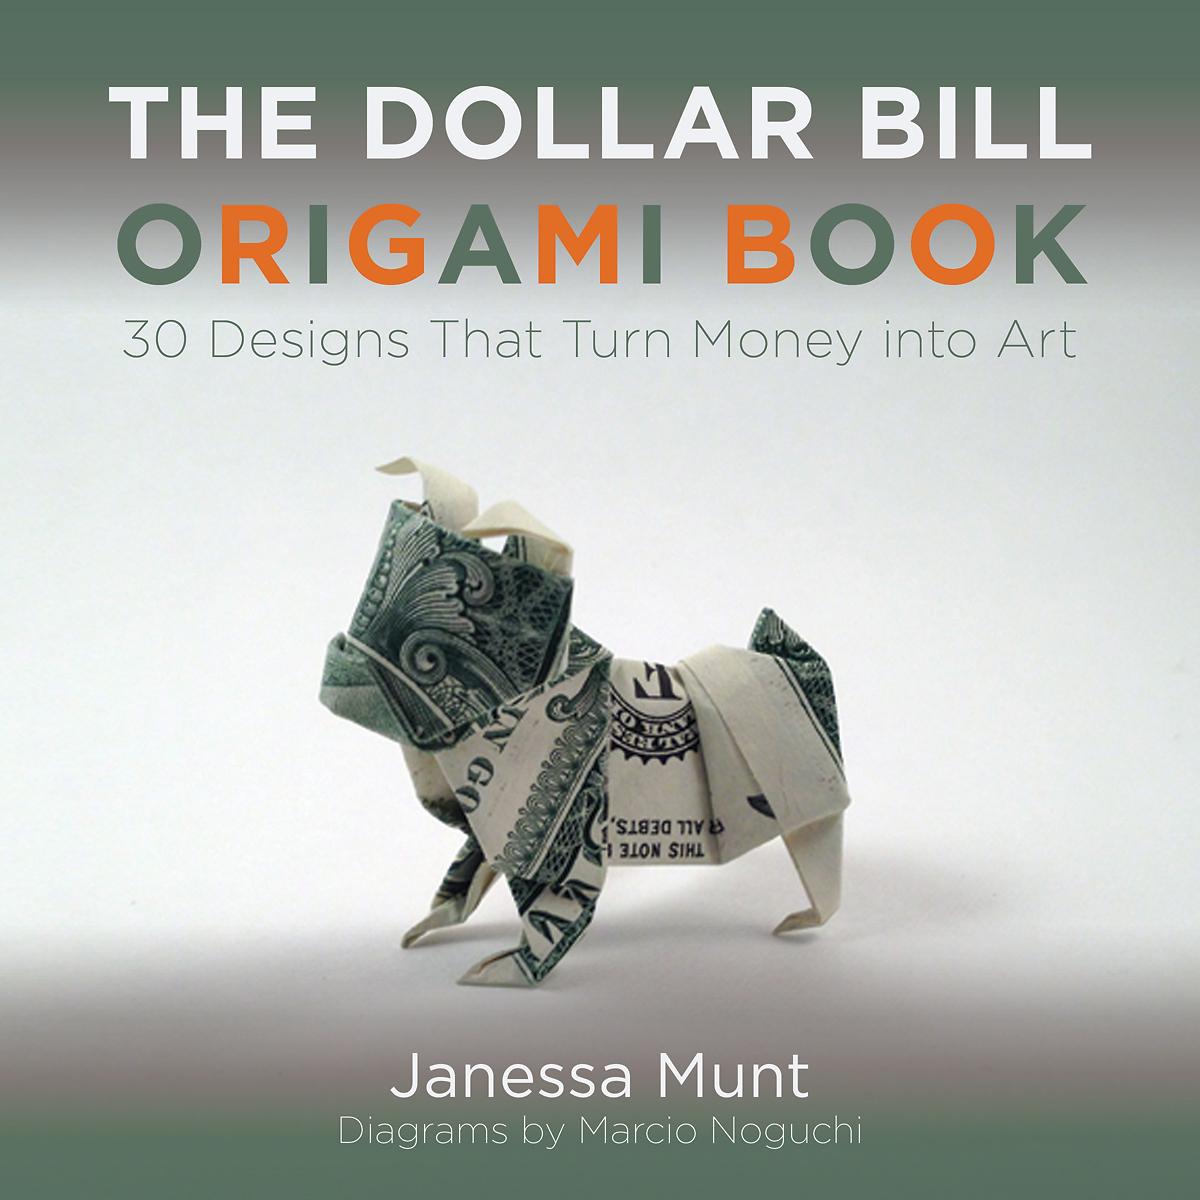 The Dollar Bill Origami Book: 30 Designs That Turn Money into Art Janessa Munt